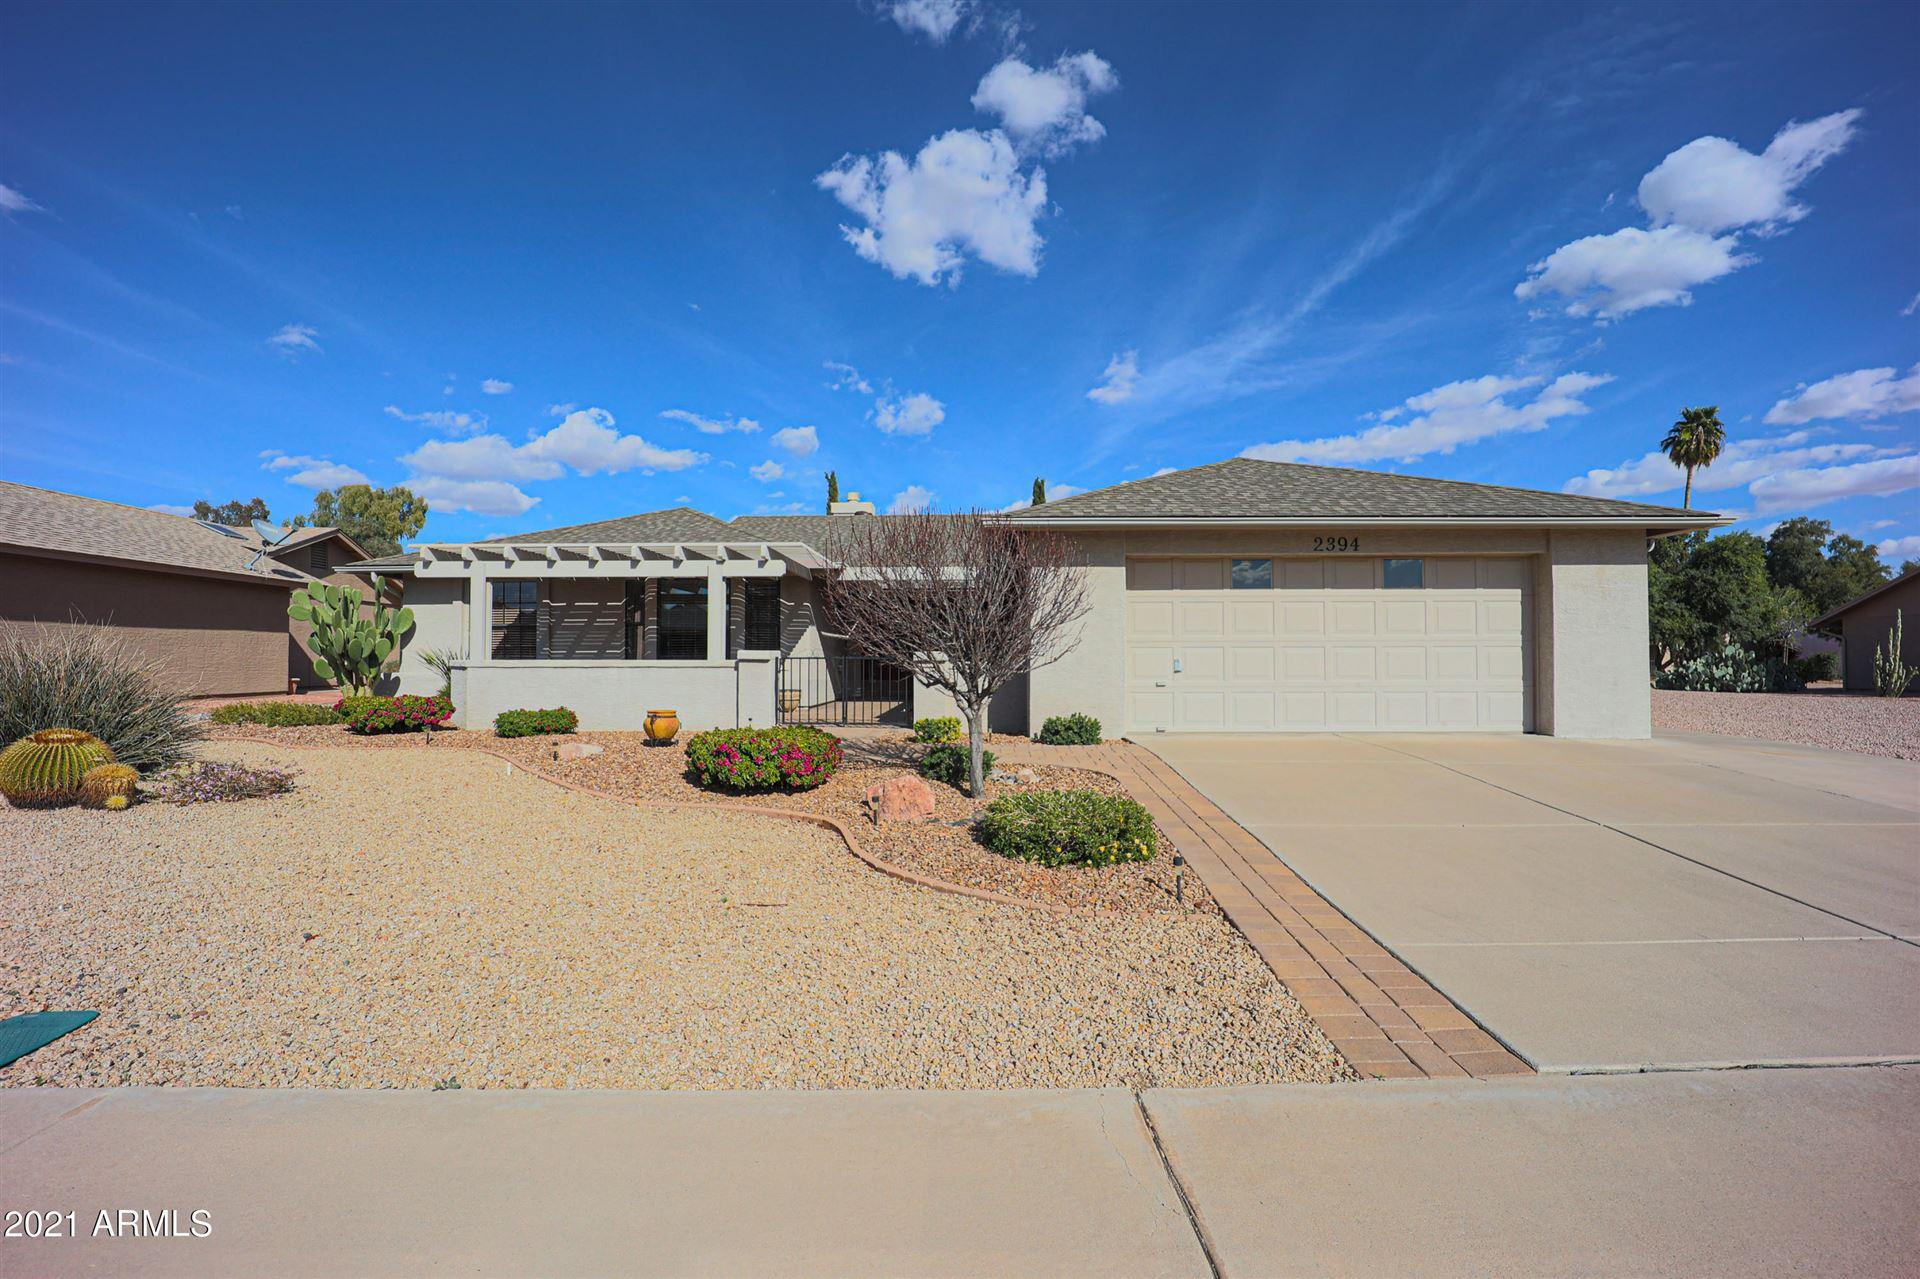 Photo of 2394 LEISURE WORLD --, Mesa, AZ 85206 (MLS # 6203433)